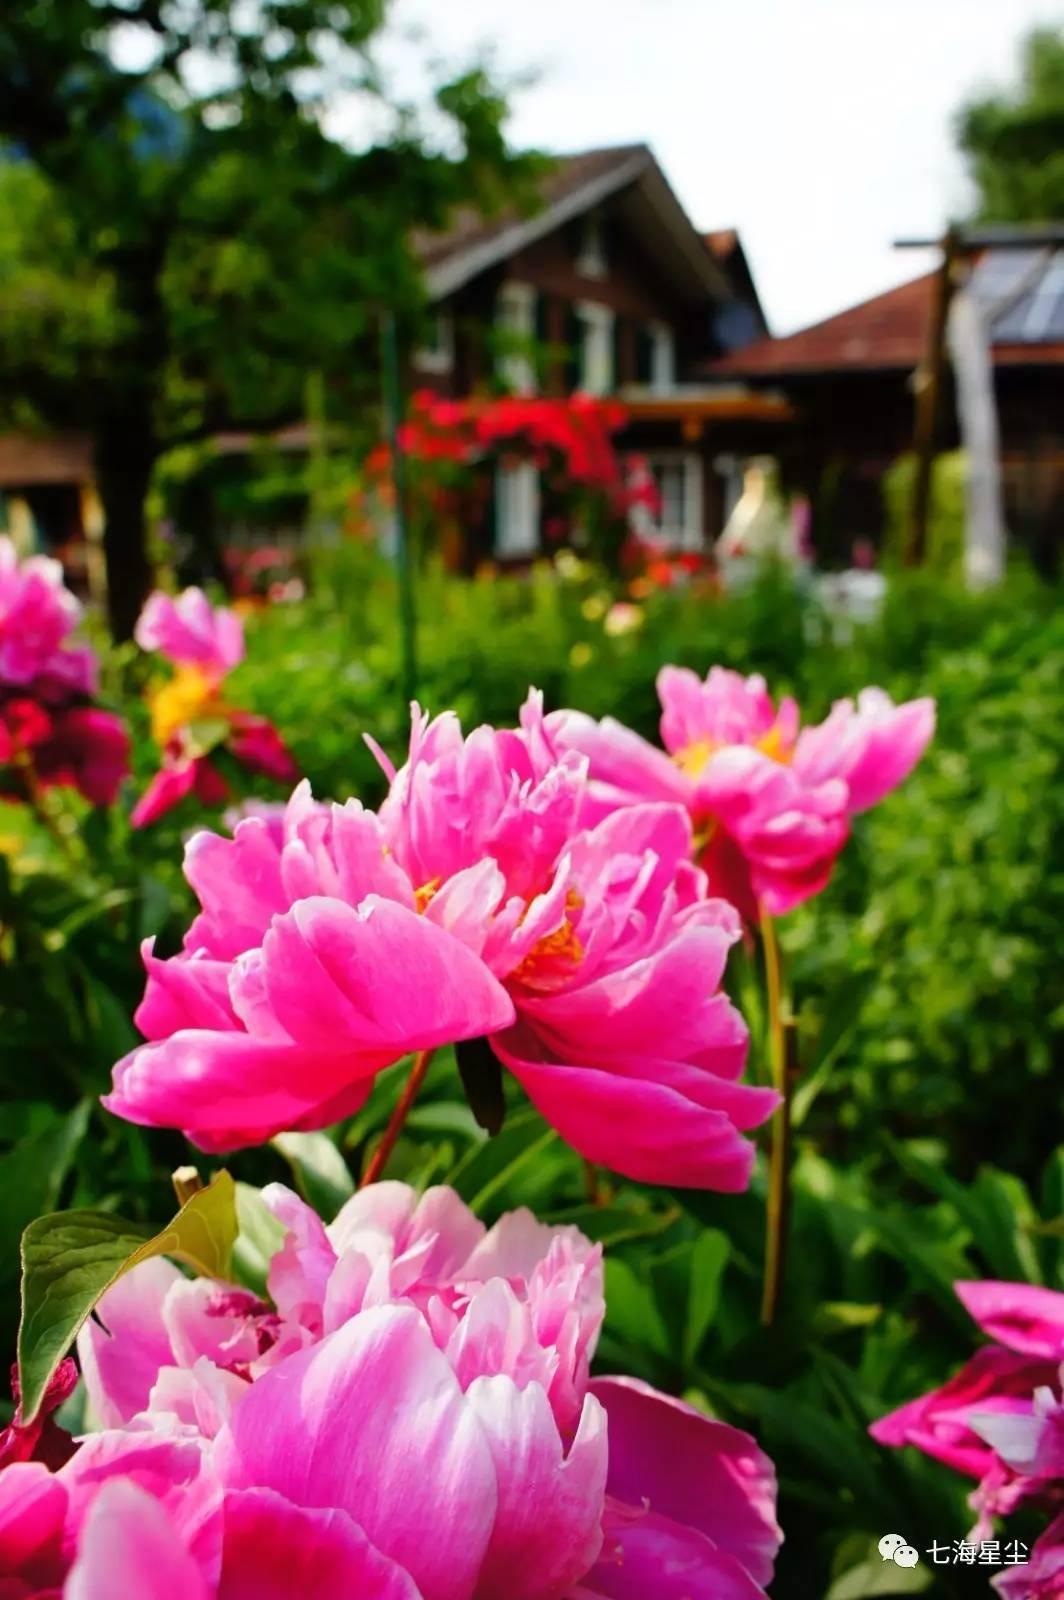 Rose【上帝是如此偏心,把所有的美丽都留给了这些地方】 - Rose - Rose Yang的博客